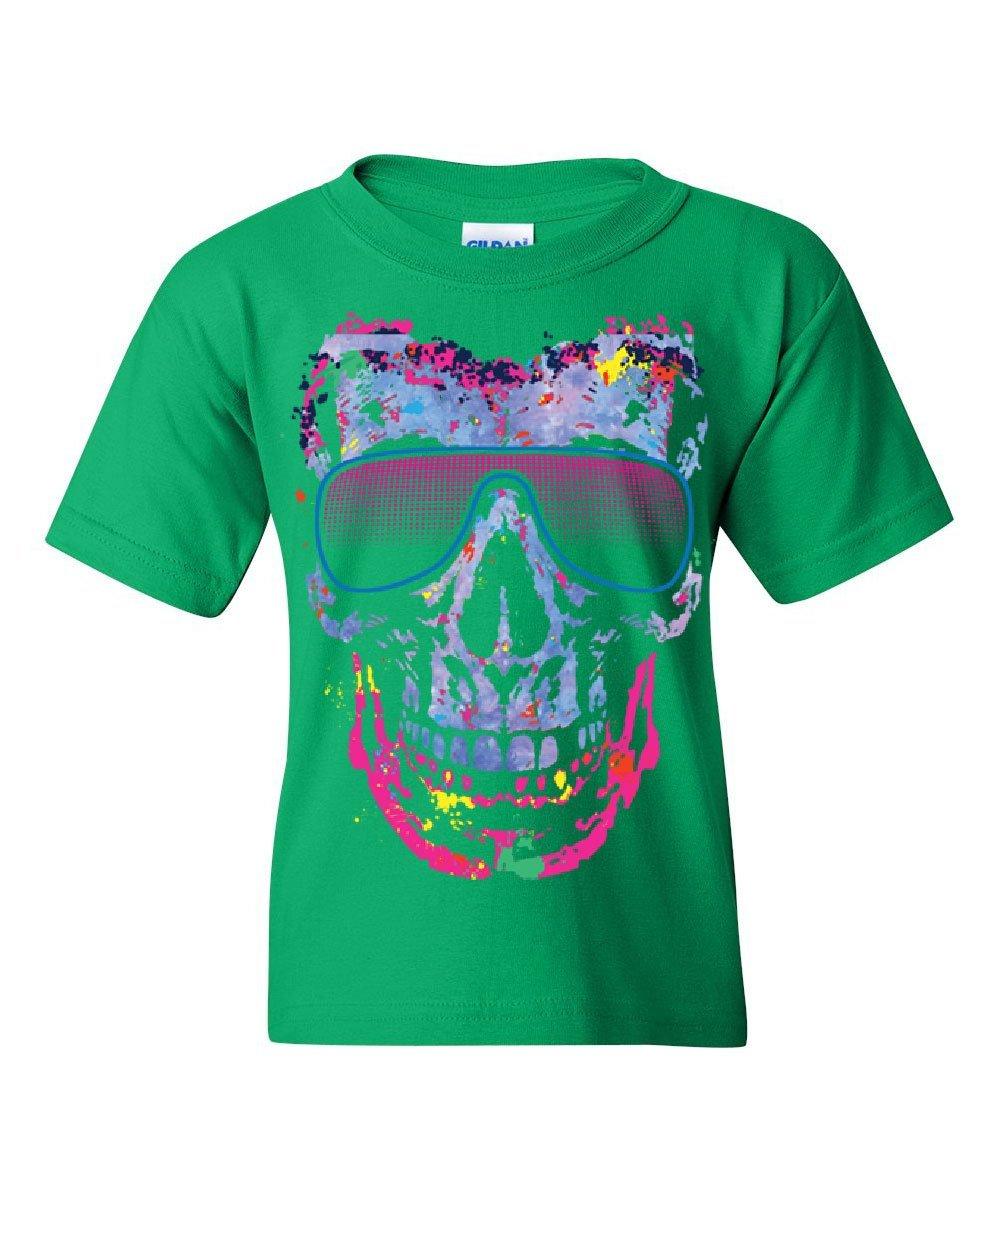 Neon Skull Sunglasses Youth T-Shirt Swag Multicolor Music EDM Rave Pop Kids Tee Green S